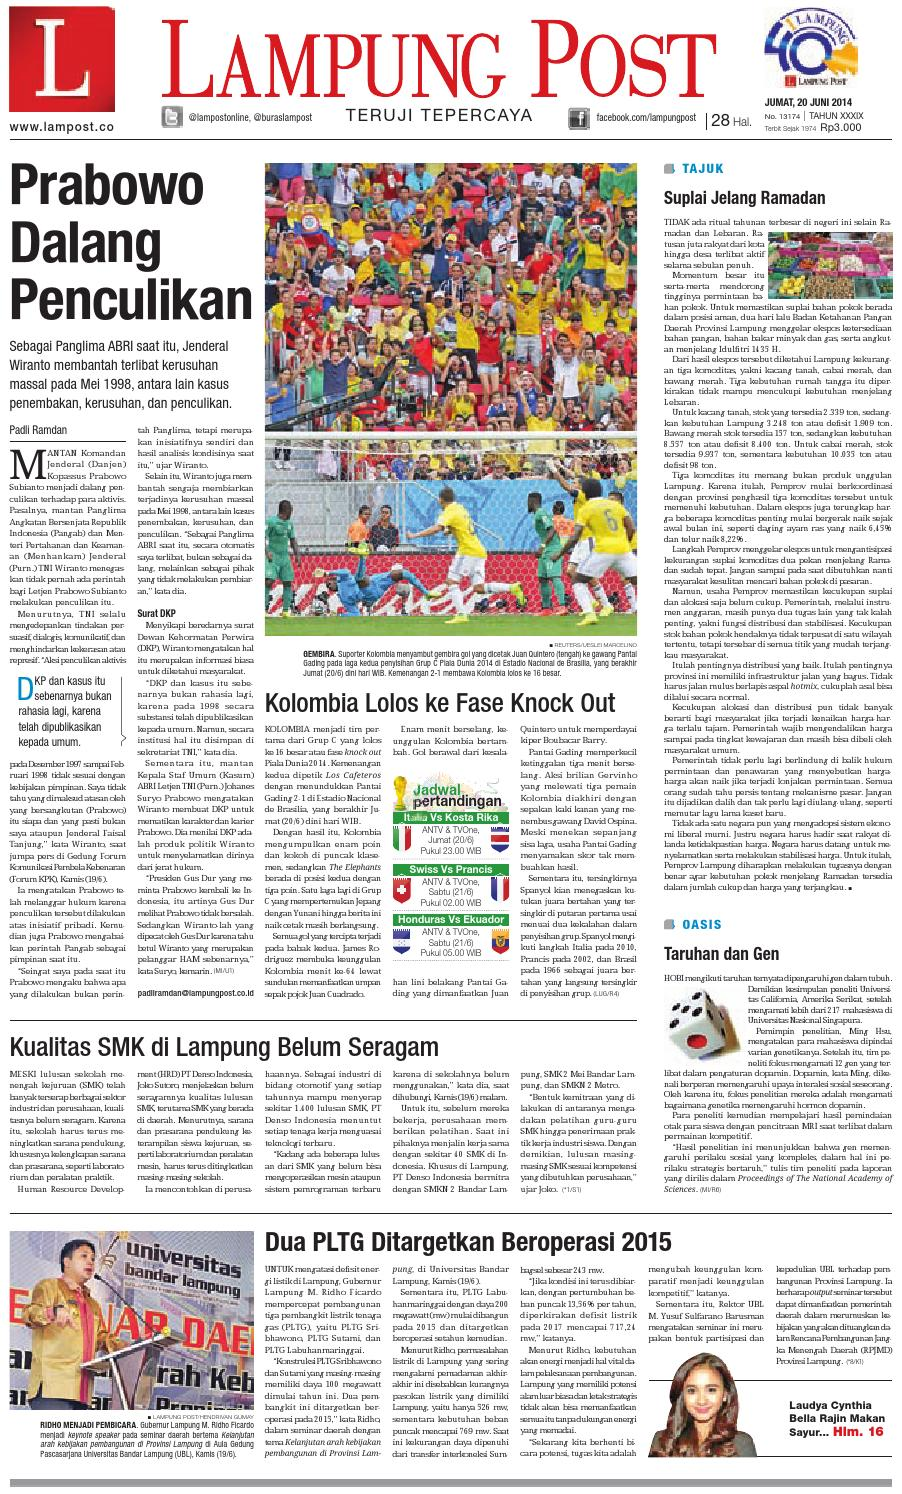 Lampungpost edisi 20 juni 2014 by Dorizo Hermawan - issuu b5e79ccfb9